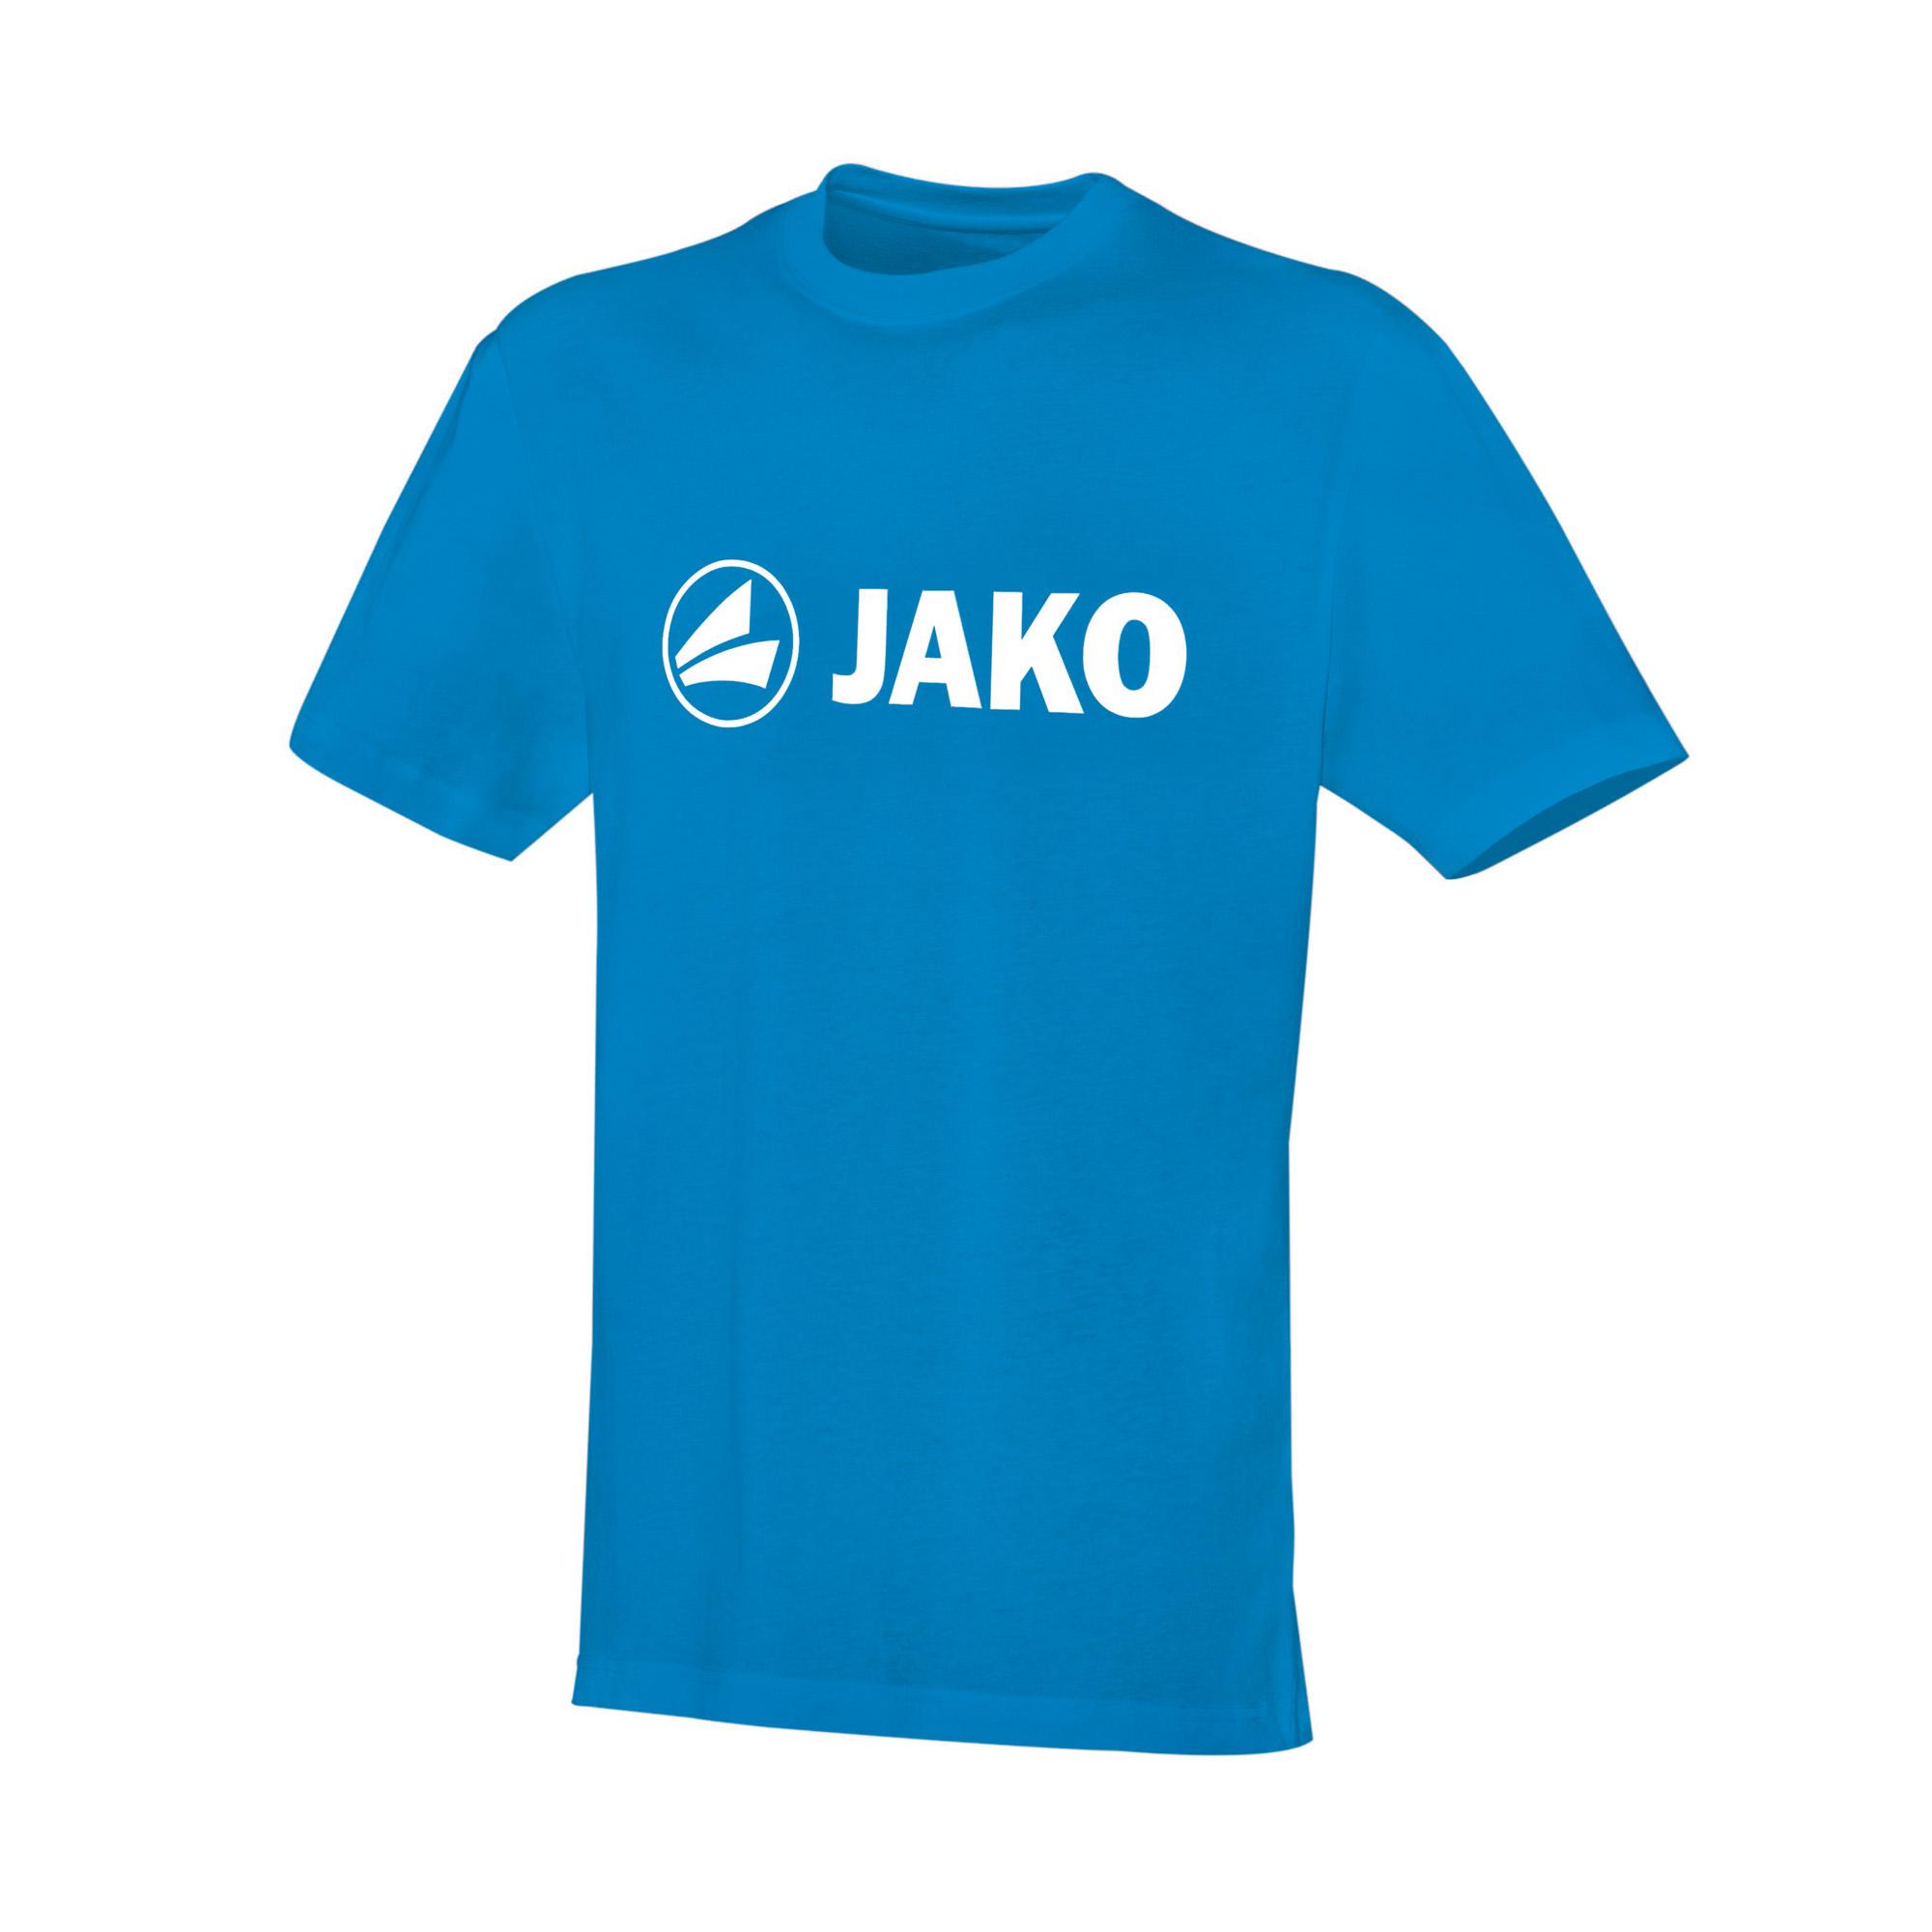 Jako Kinder T-Shirt Promo 6163-89 164